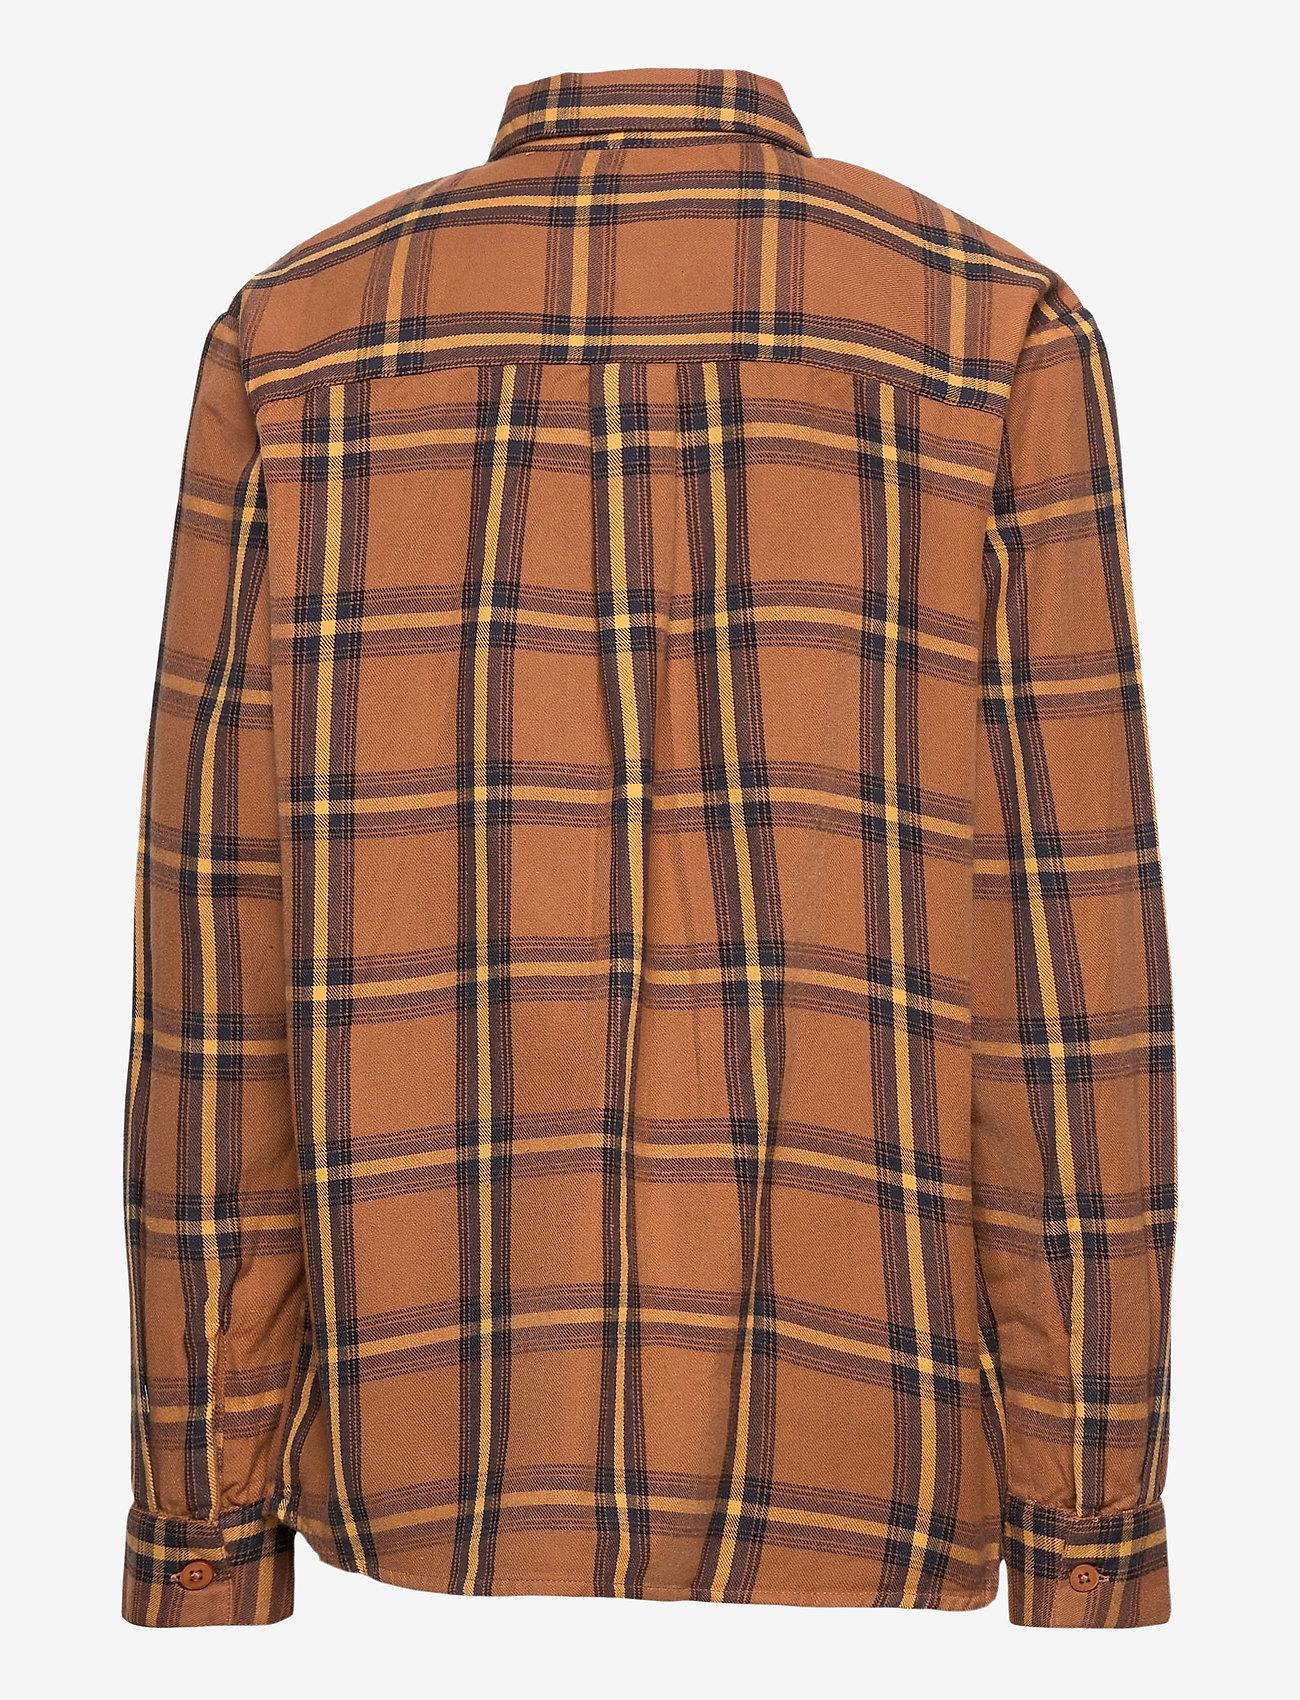 Costbart - KENNETH L_S CHECK SHIRT - overhemden - chipmunk - 1